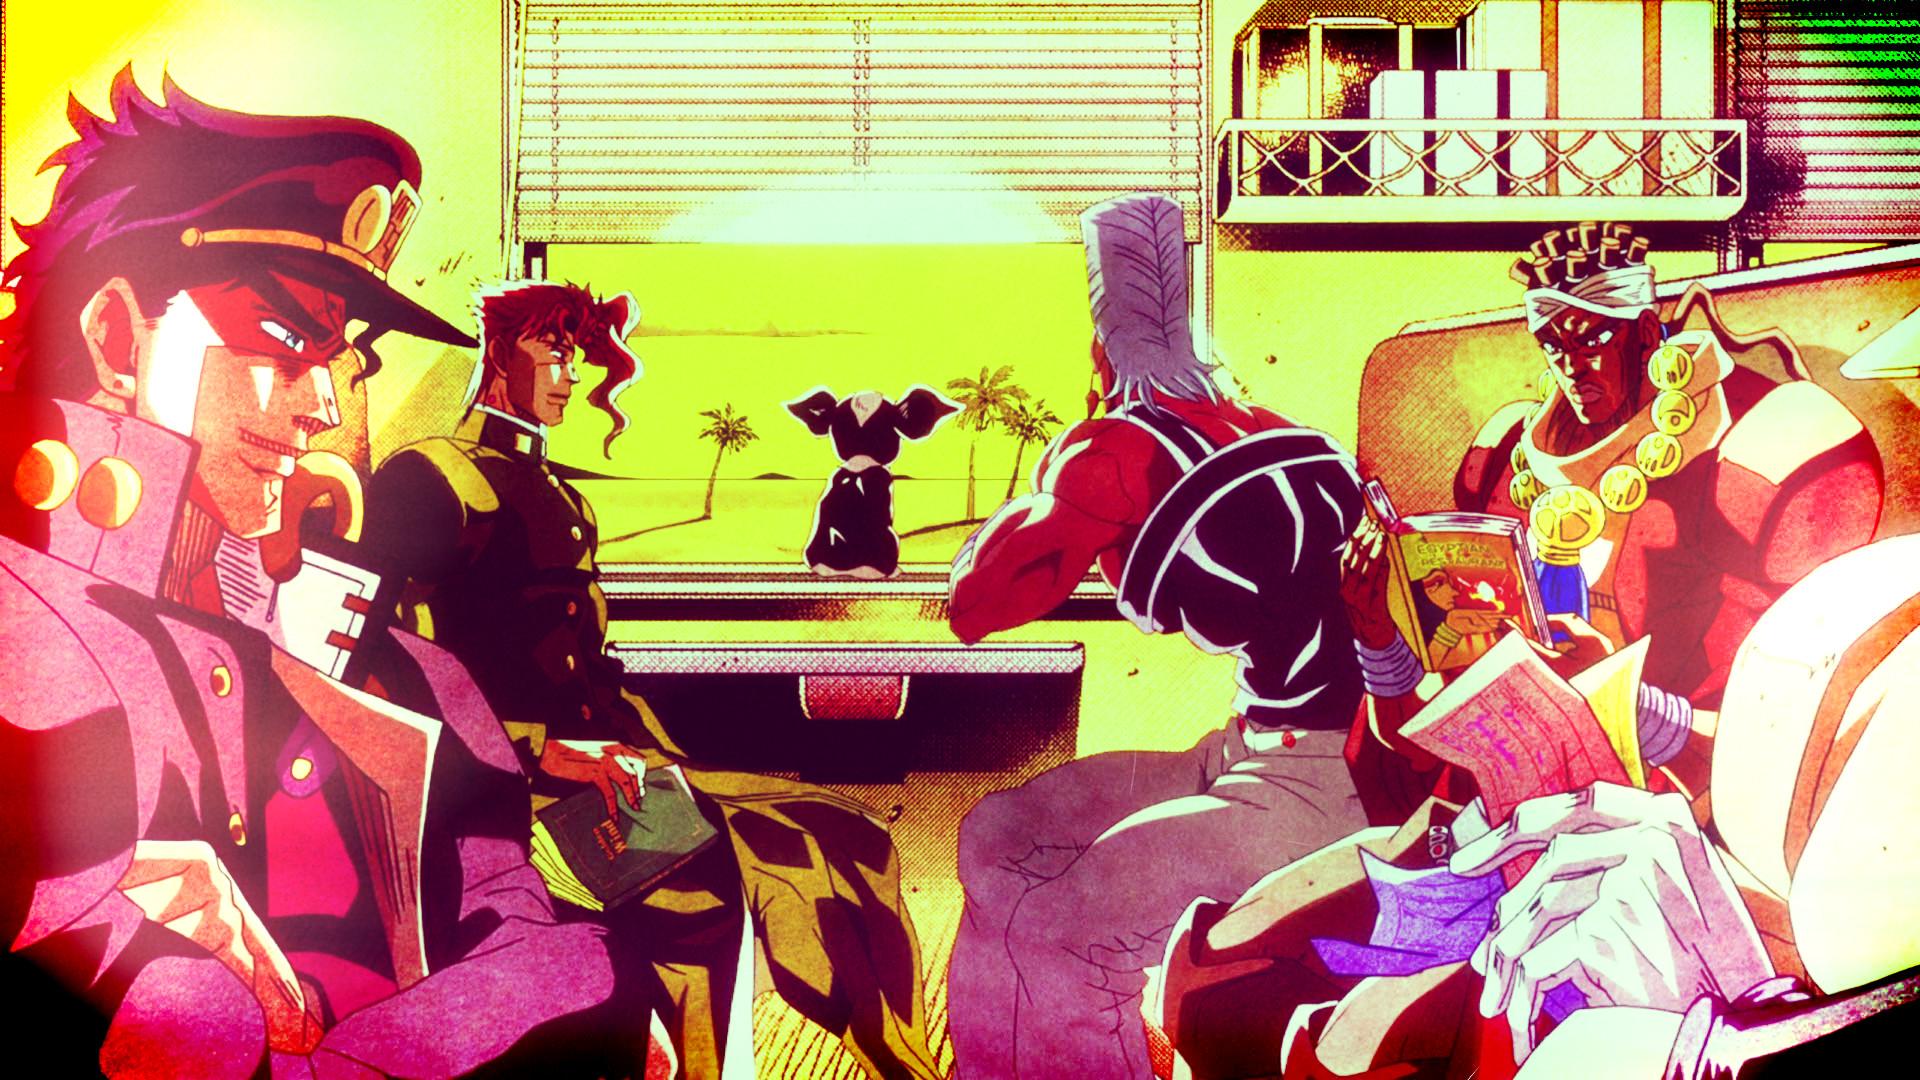 Anime – Jojo's Bizarre Adventure Jotaro Kujo Muhammad Avdol Iggy (Jojo's  Bizarre Adventure) Noriaki